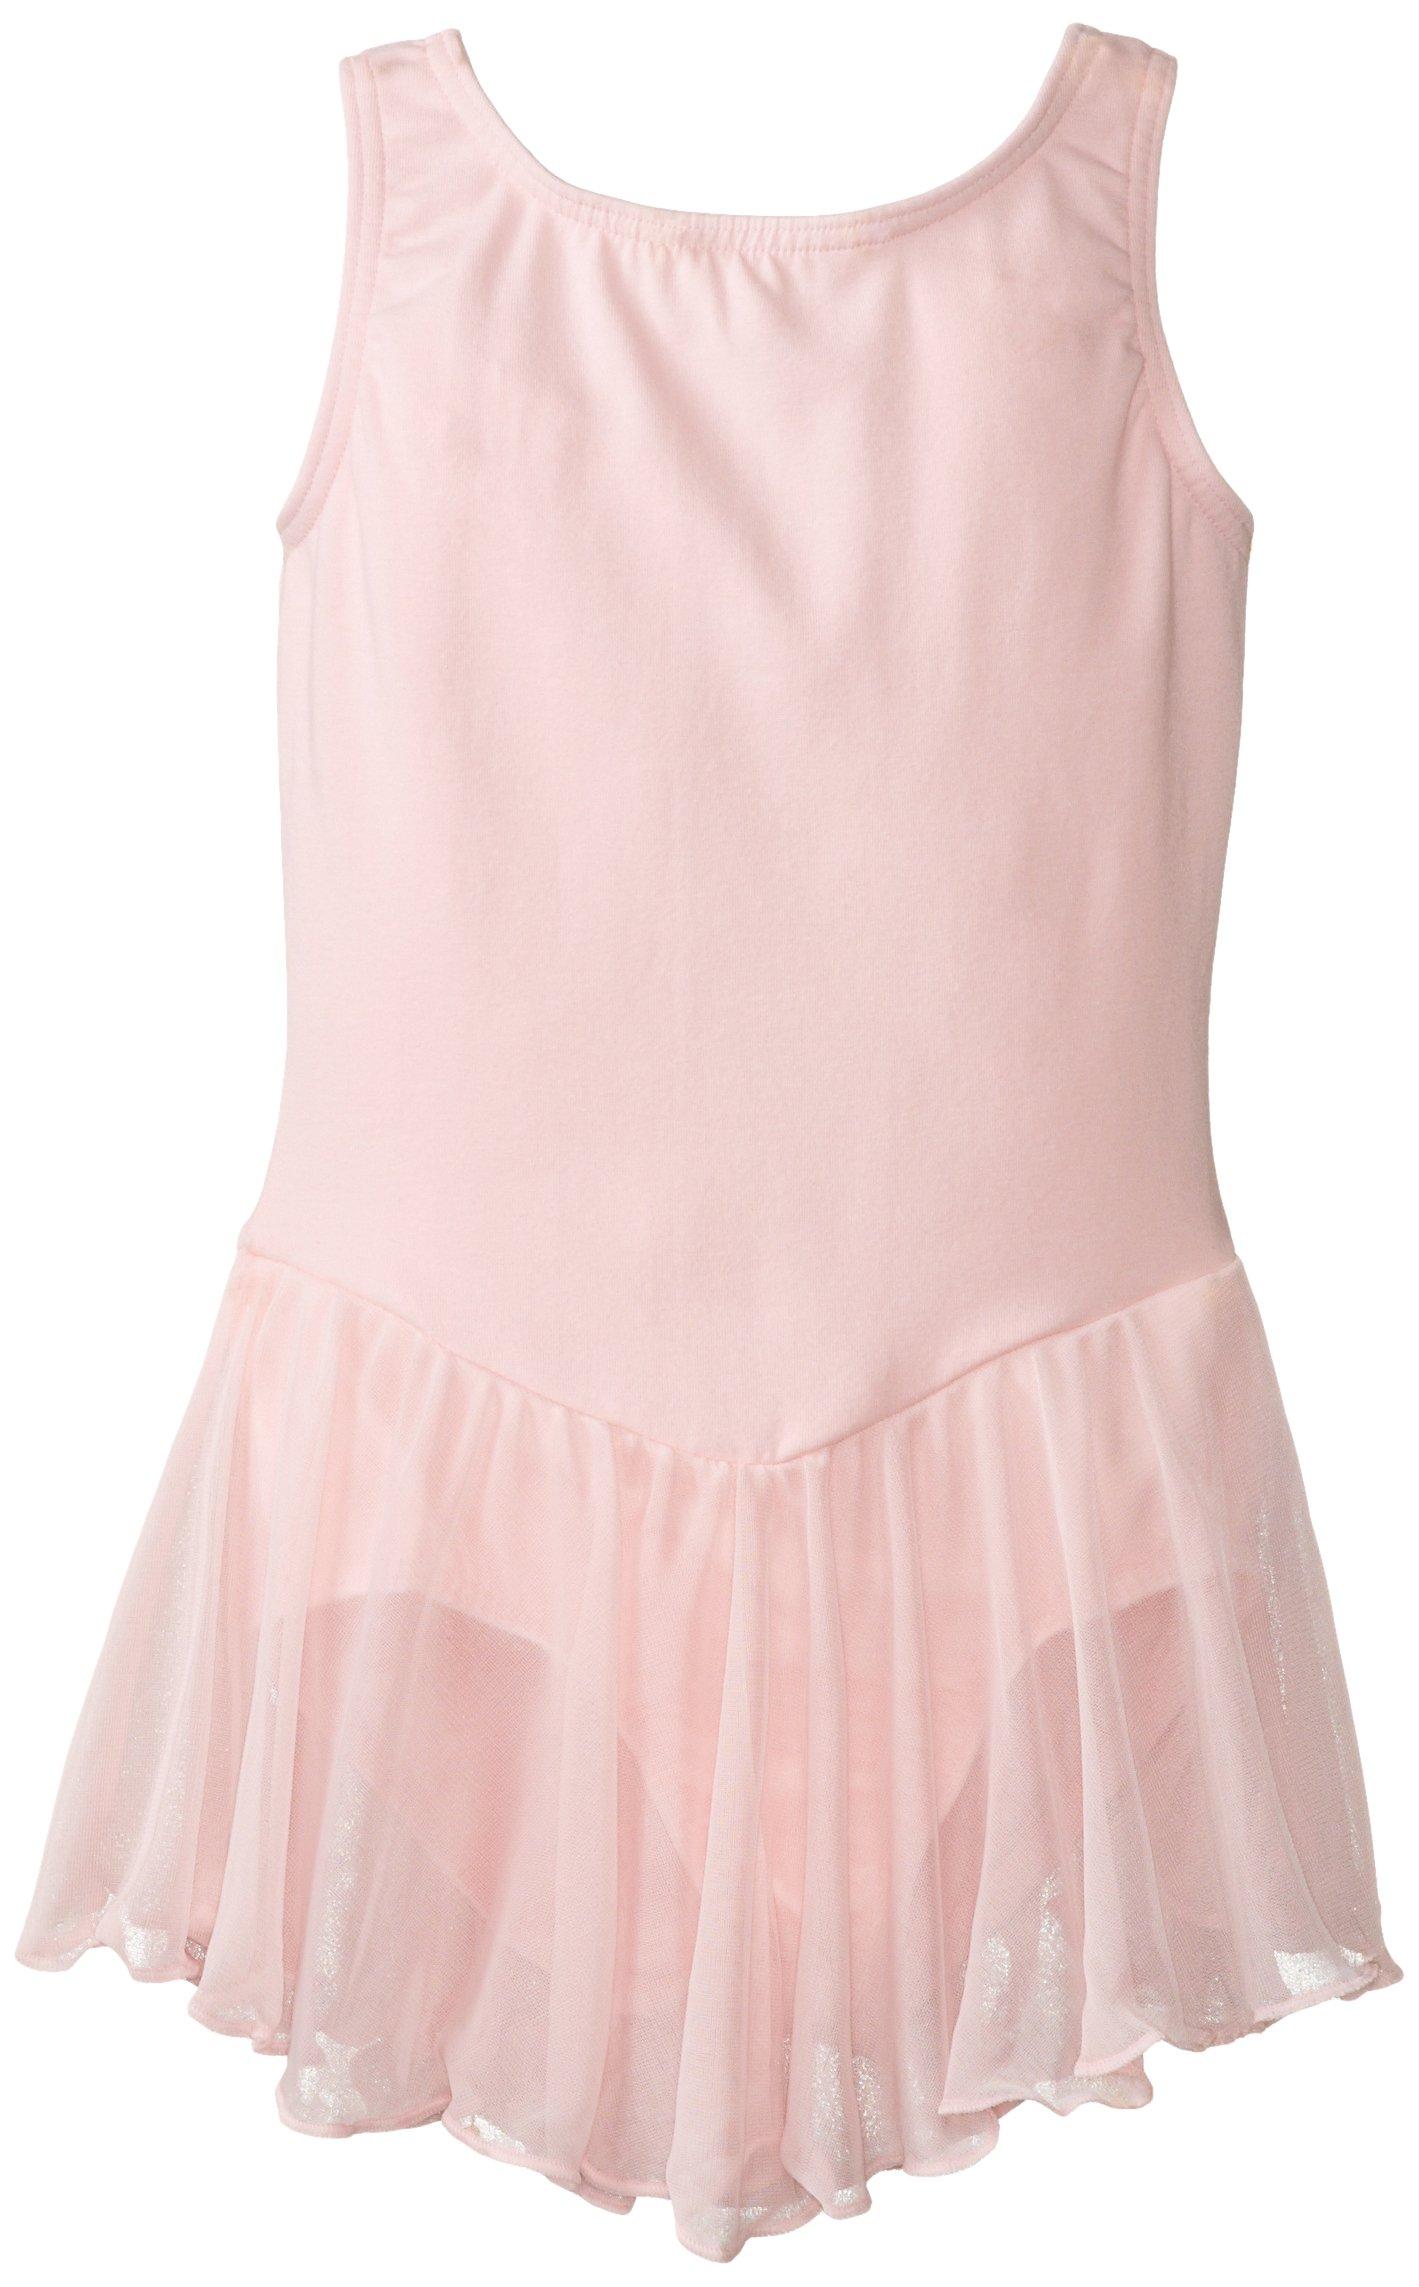 Clementine Girl's 2-6X Girls Leotard Dress, Light Pink, 16